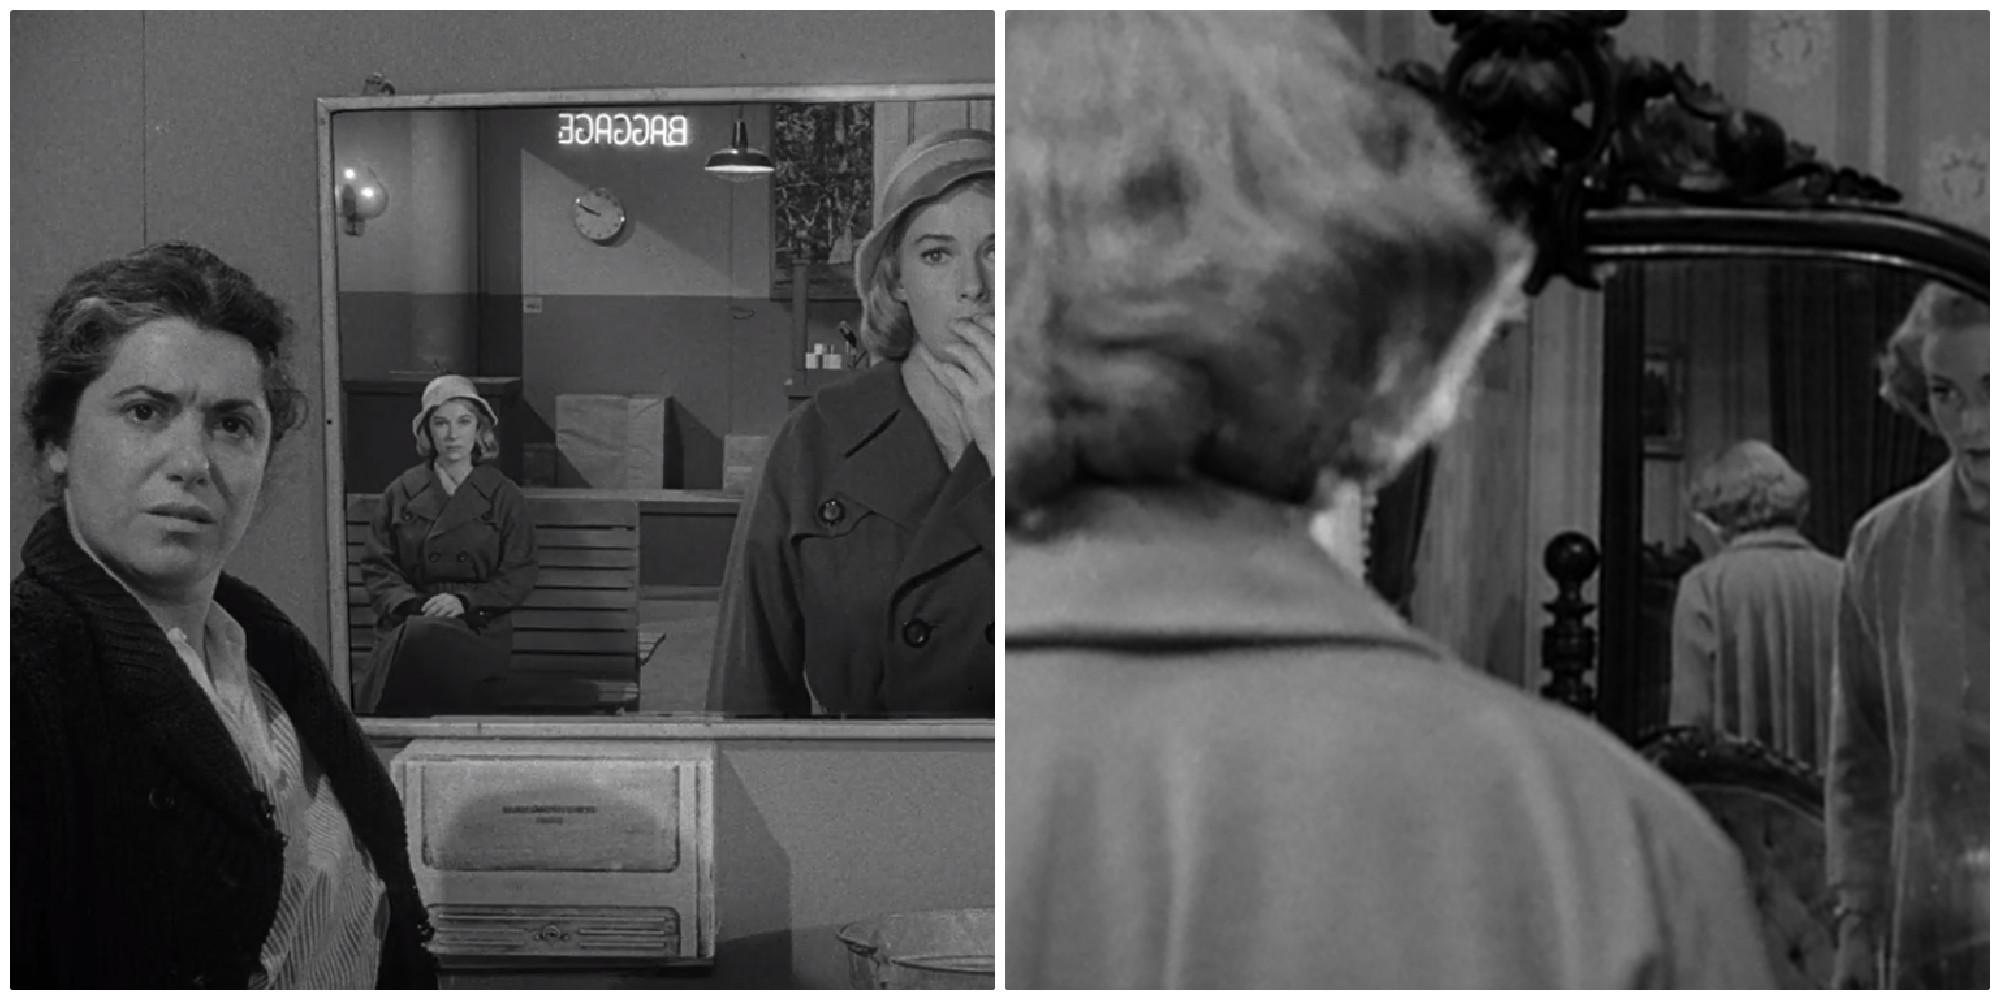 5 Twilight Zone Episodes That Influenced Modern Horror Film Horror Movie Horror Homeroom